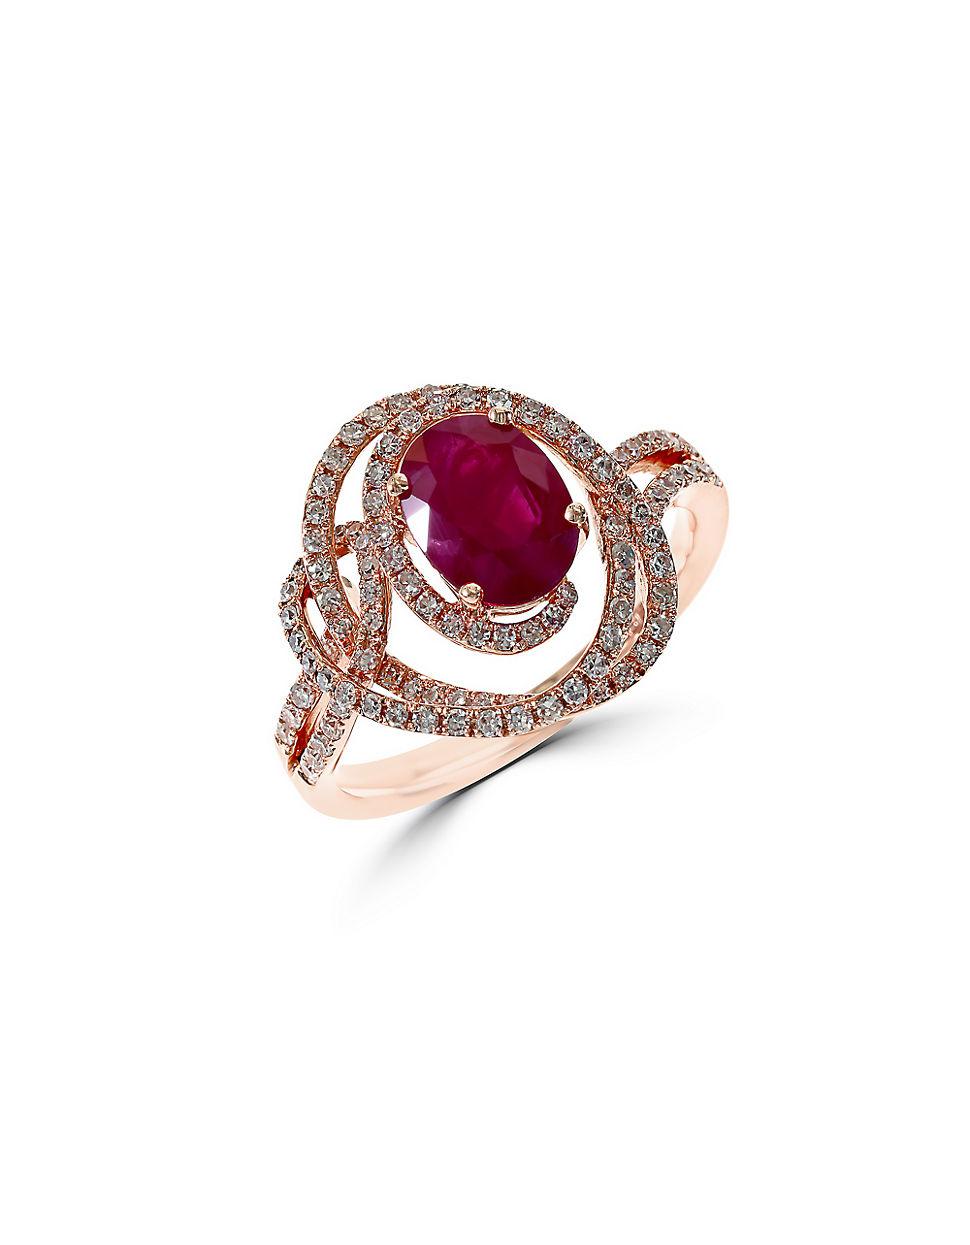 Effy Jewelry Ruby Ring